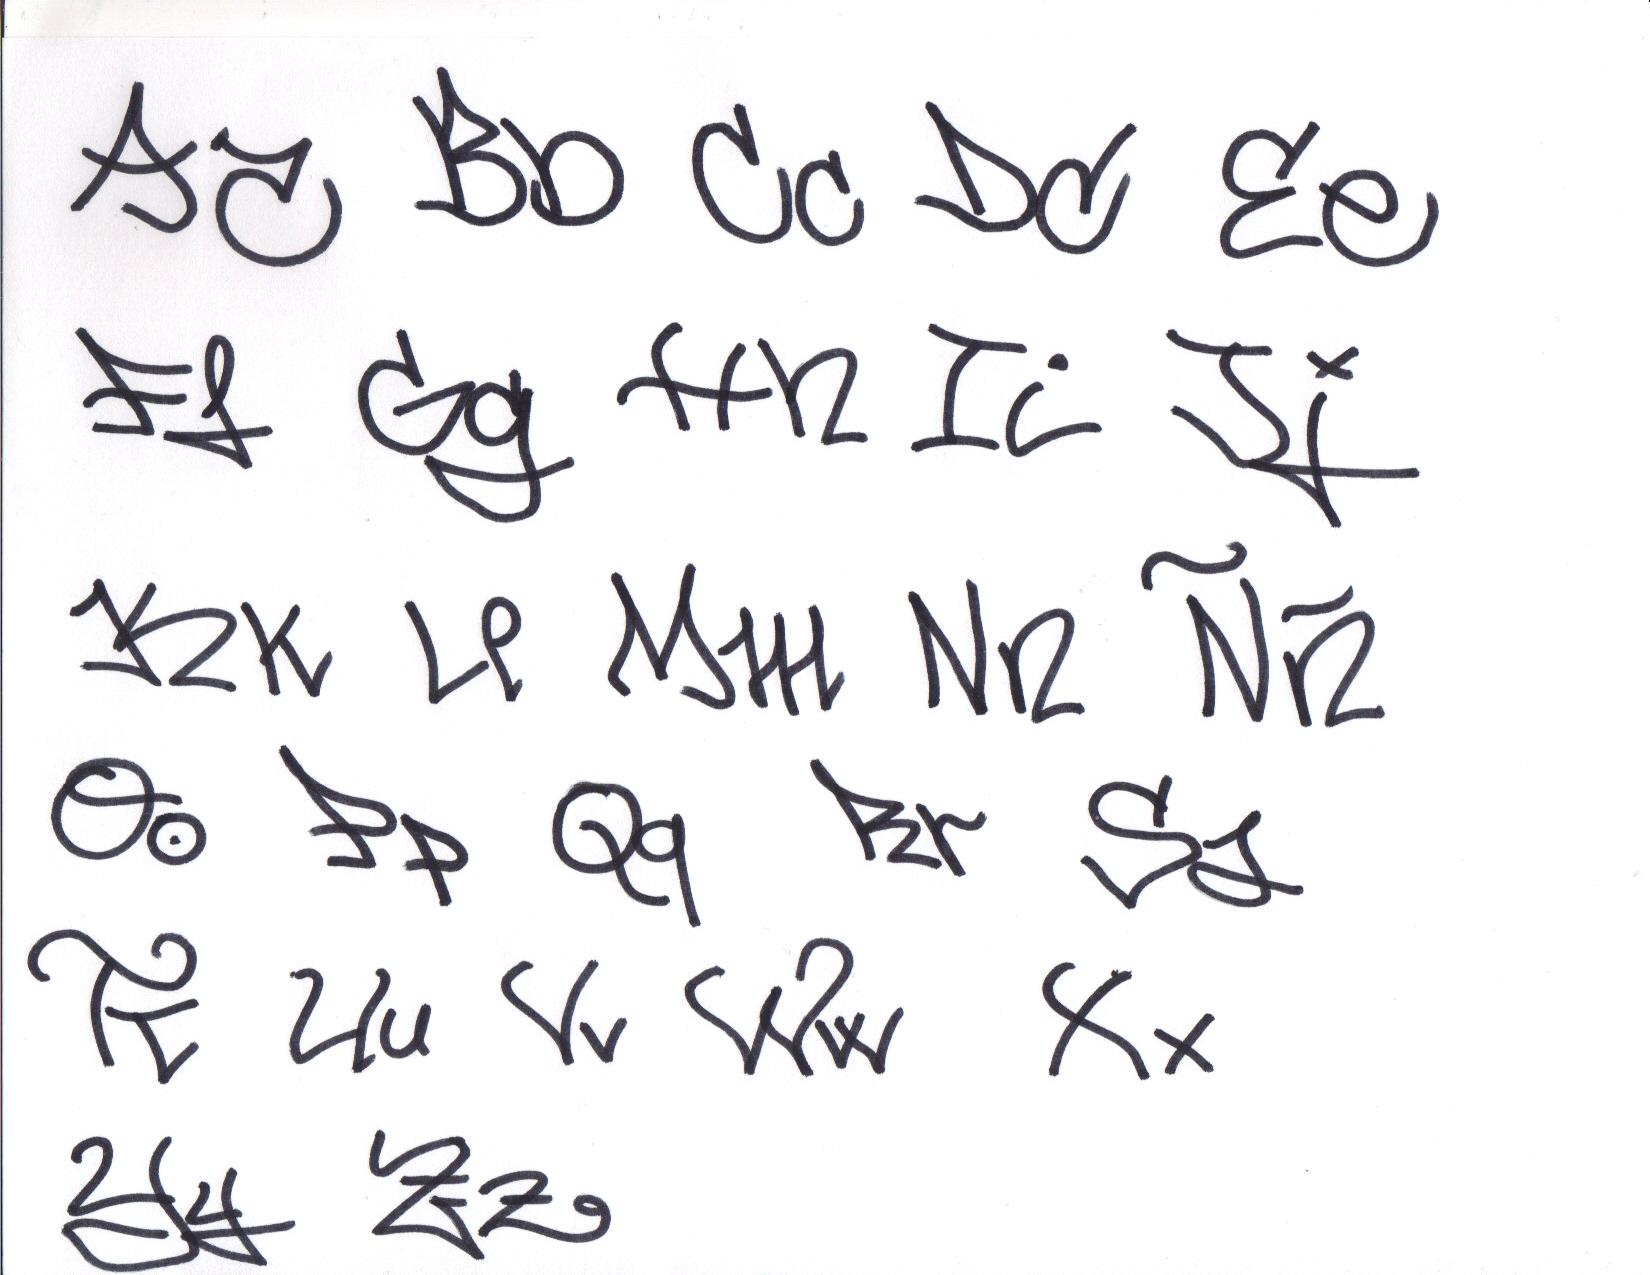 Tipos de letras de graffiti (IV)